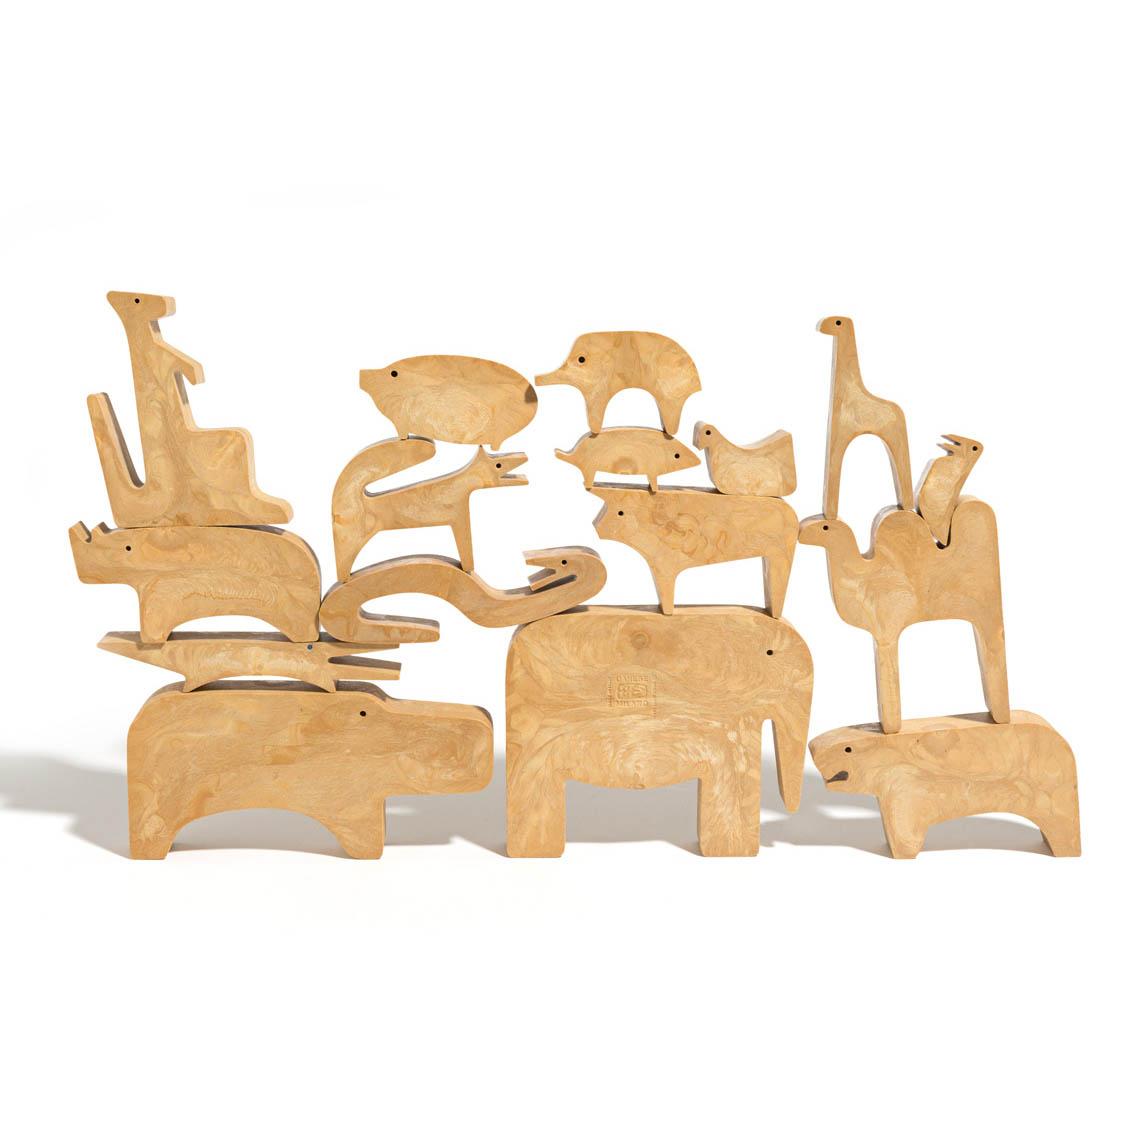 Danese Milano 16 Animali Puzzle By Enzo Mari Toys Amp Games